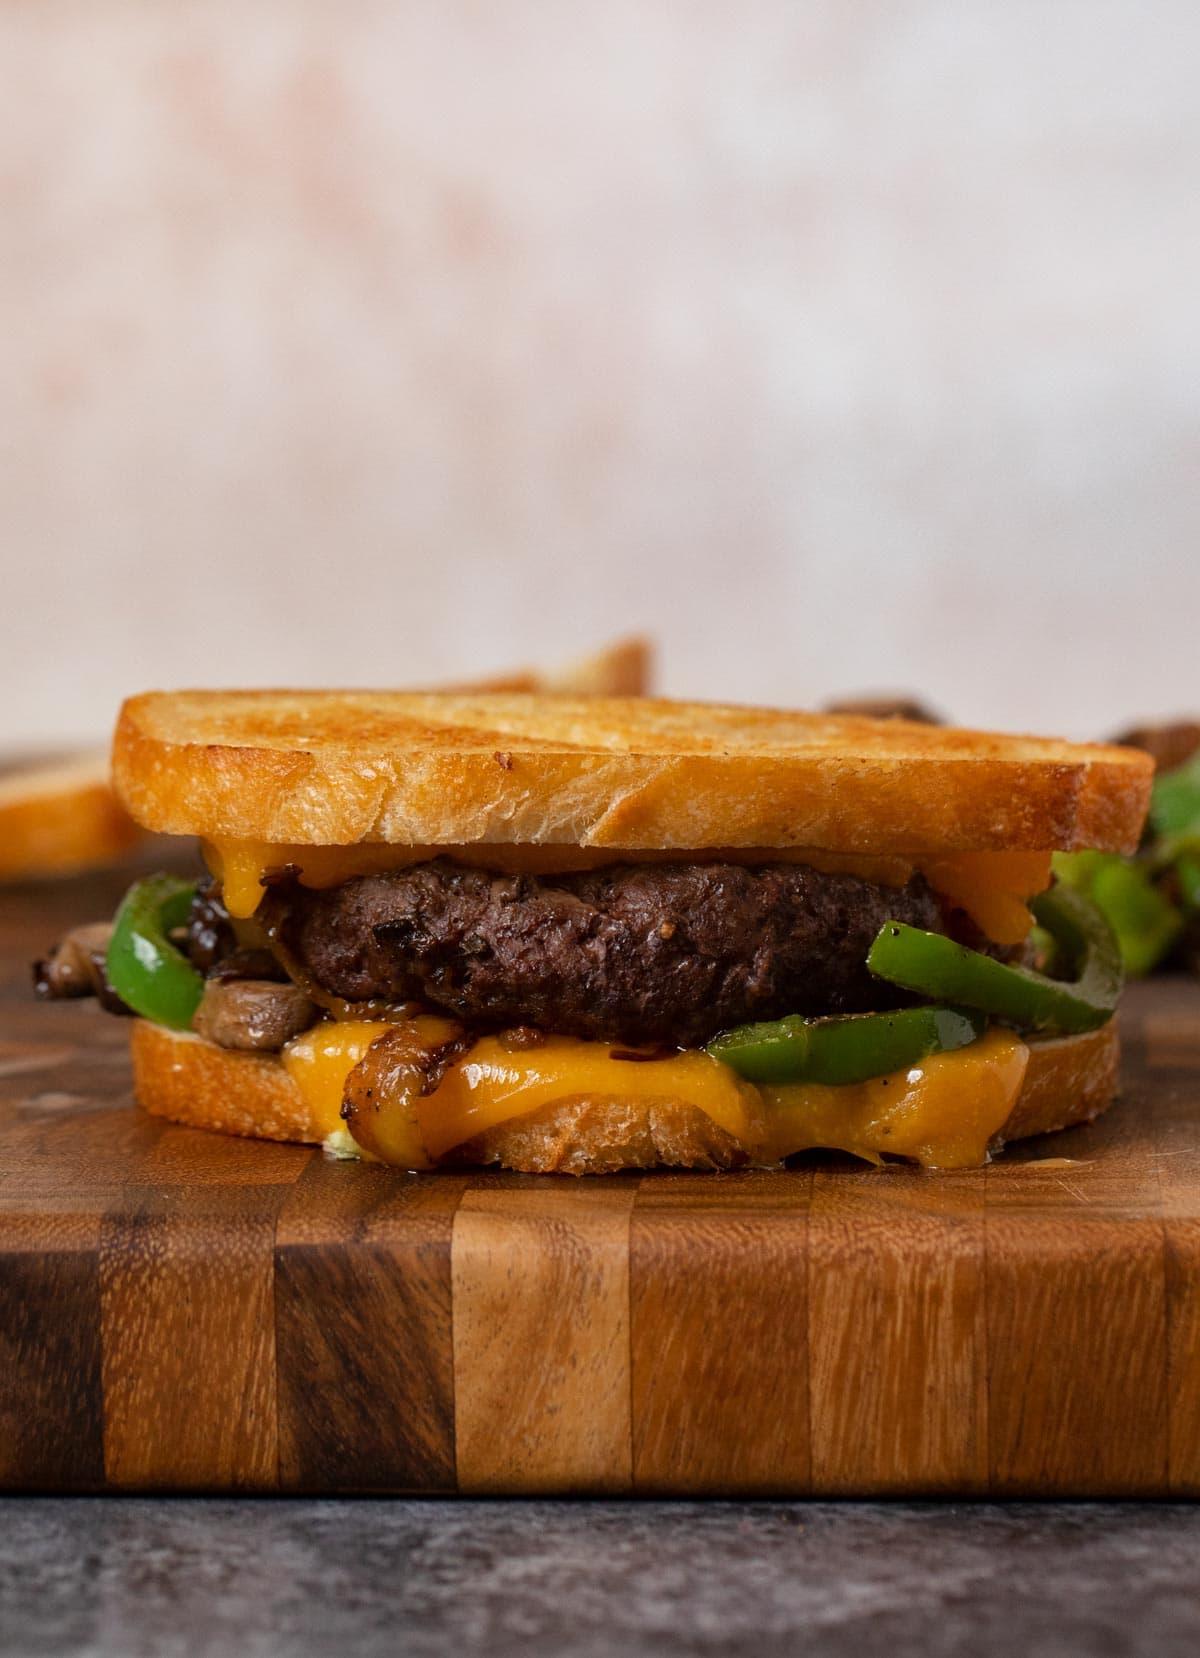 Philly Cheesesteak Patty Melt sandwich on cutting board